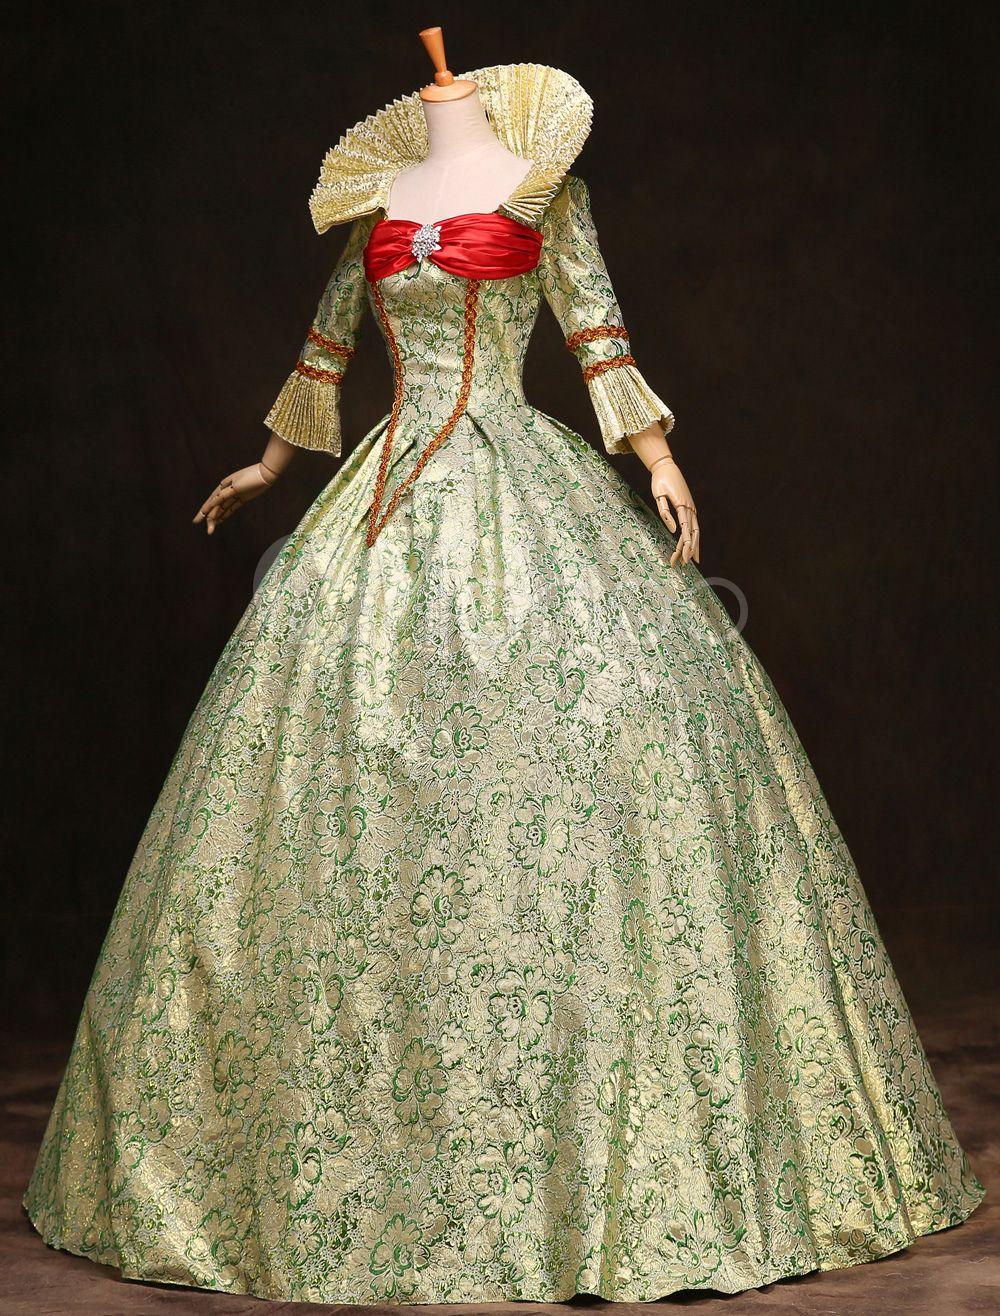 Milanoo / Royal Retro Costume Women's Victorian Ball Gown